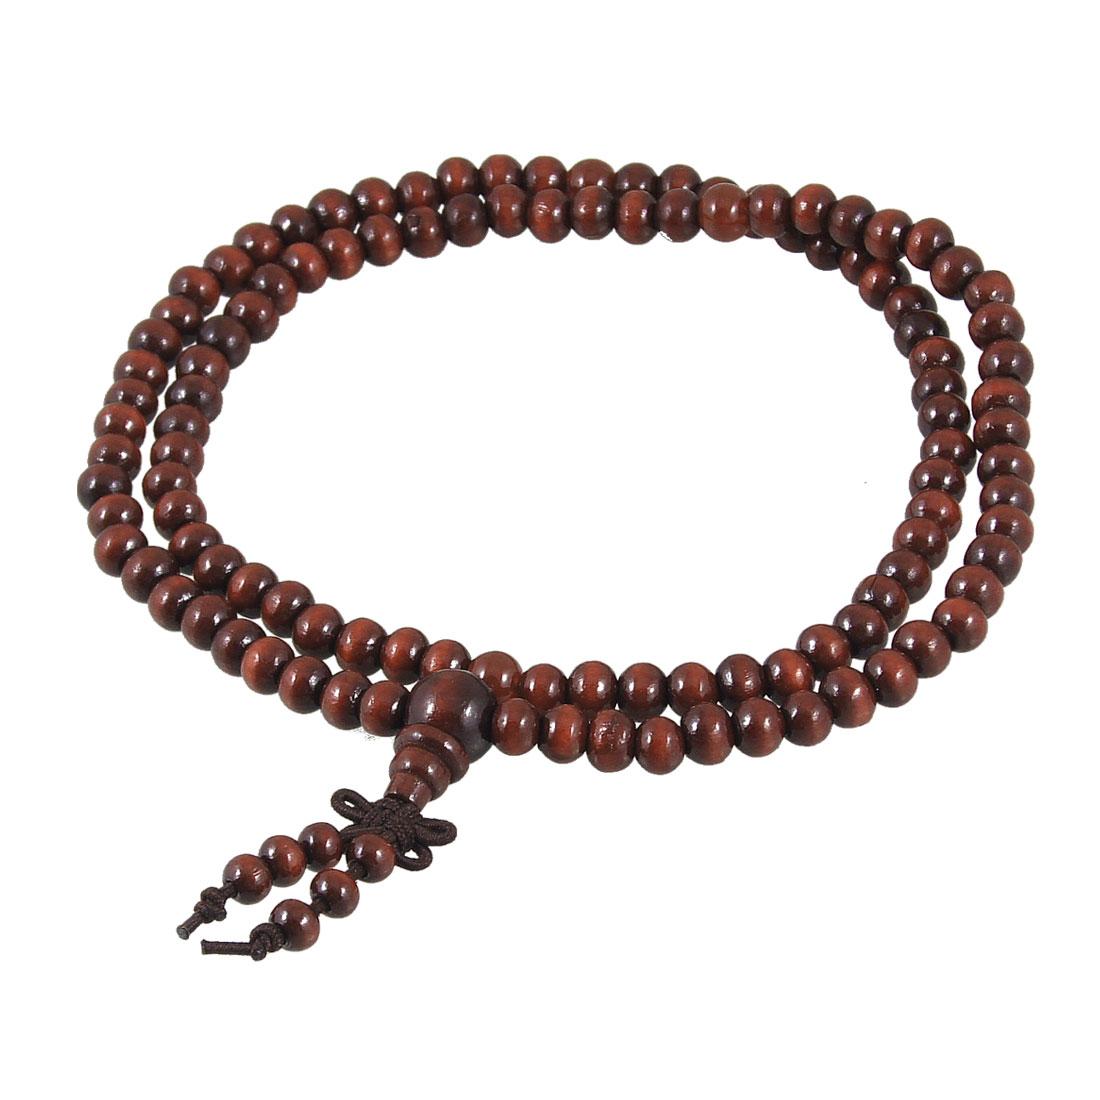 62cm Girth Buddhist Prayer Burgundy Wood Beads Elastic Necklace